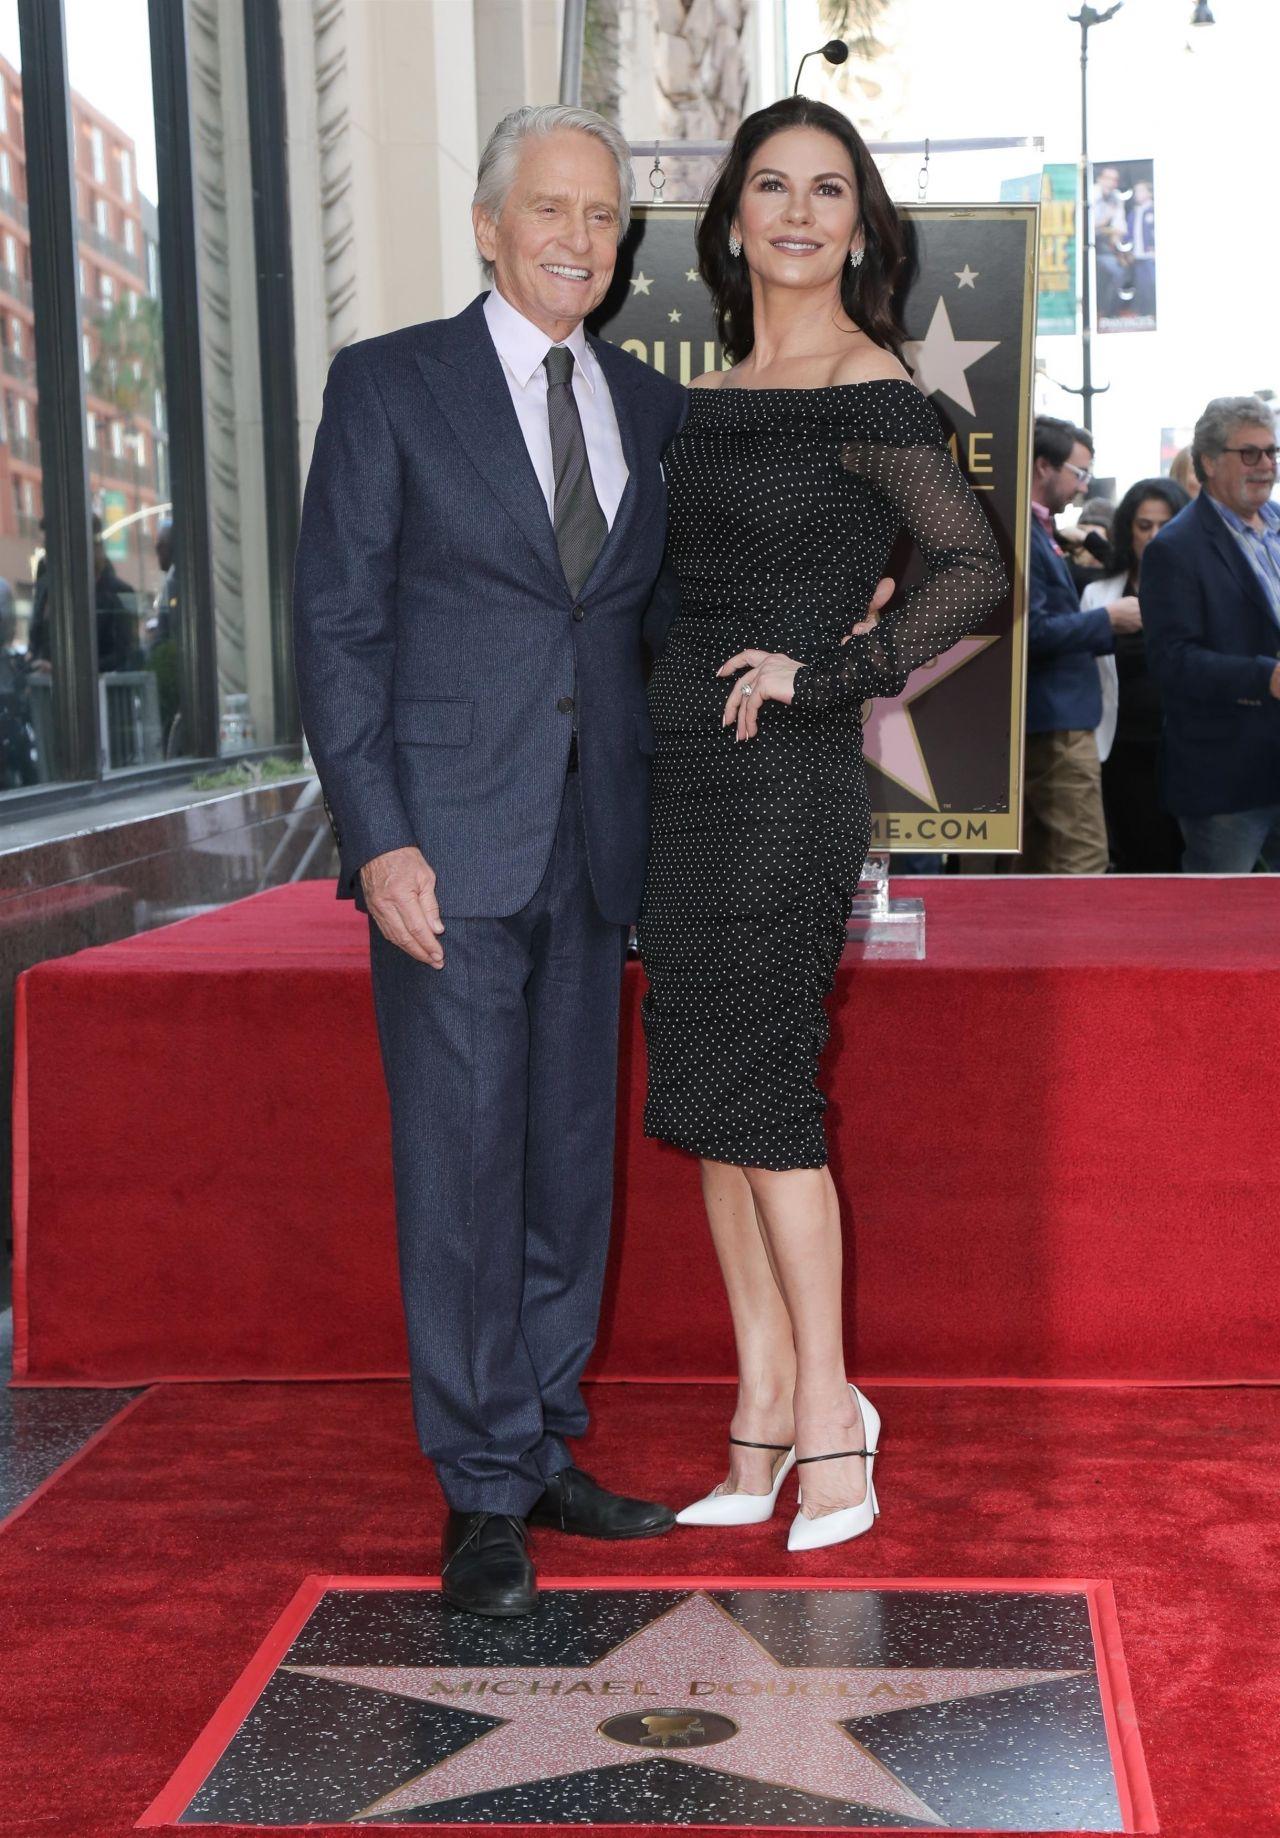 https://celebmafia.com/wp-content/uploads/2018/11/catherine-zeta-jones-michael-douglas-honored-with-a-star-on-the-hollywood-walk-of-fame-11-06-2018-9.jpg